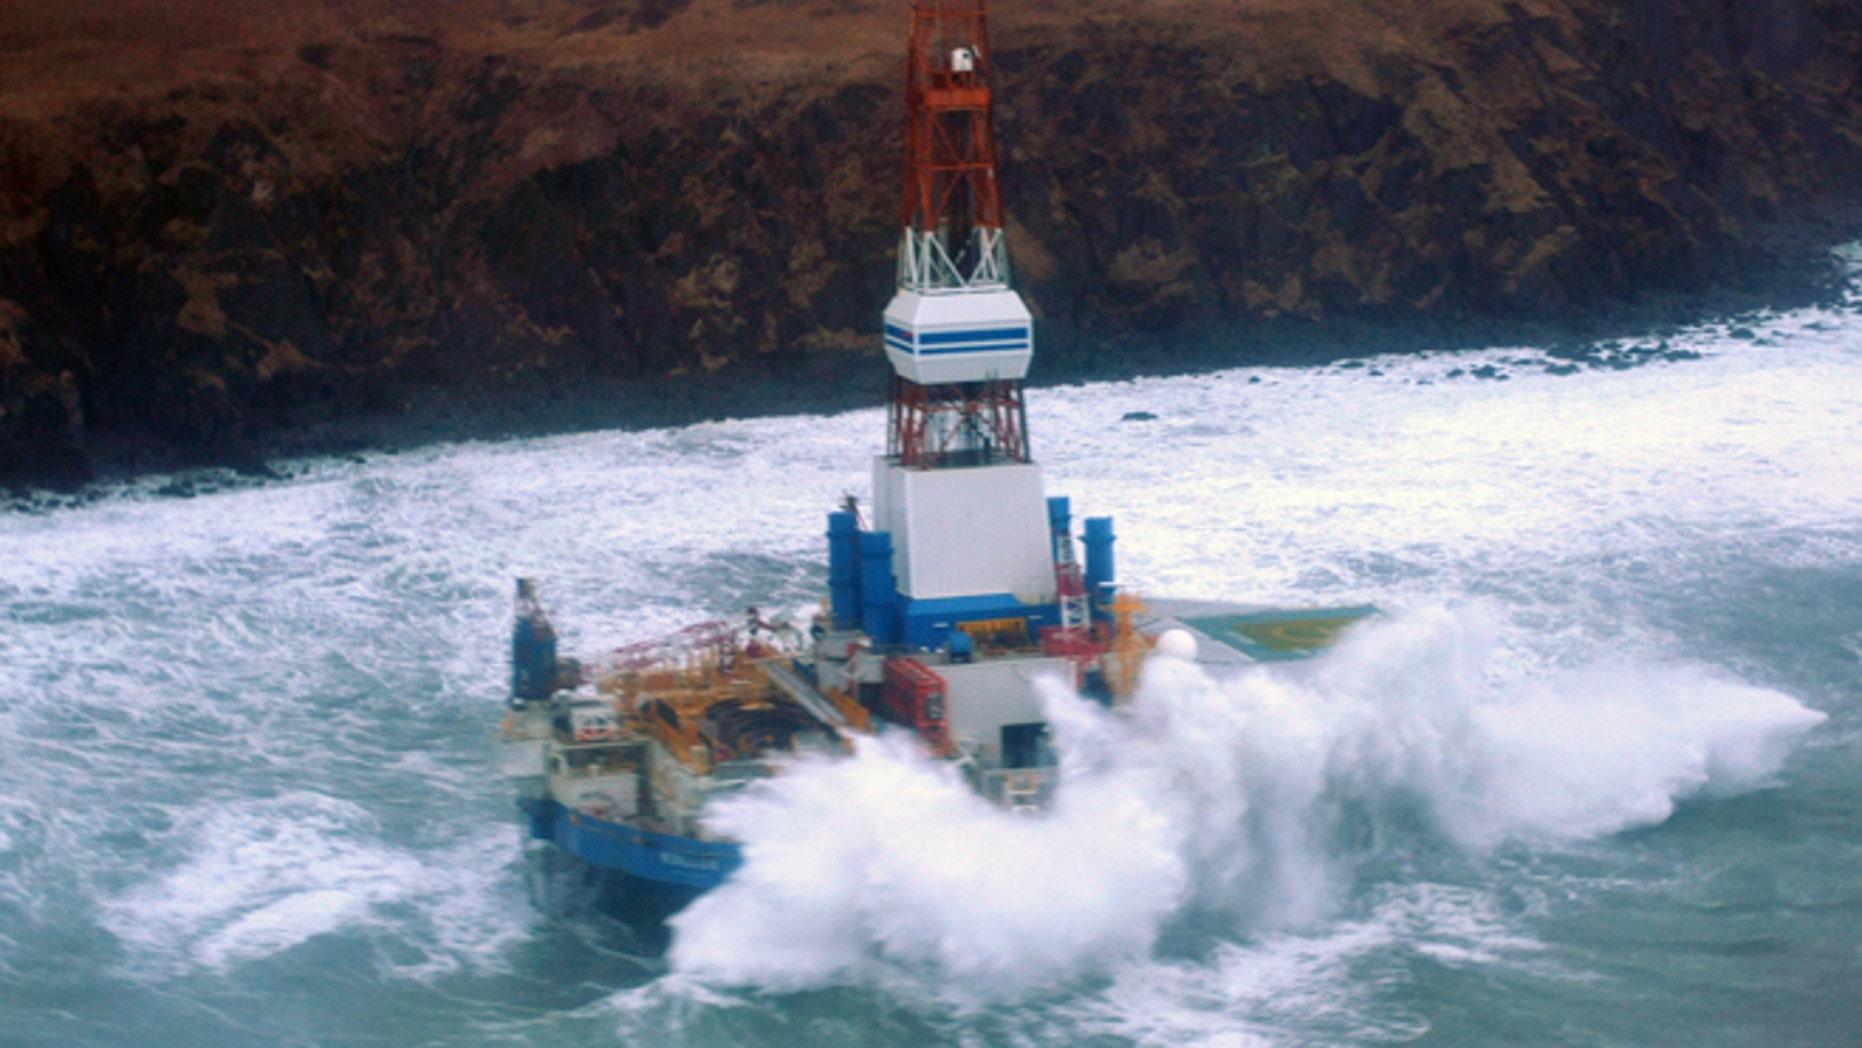 Jan. 1: This image provided by the U.S. Coast Guard shows the Royal Dutch Shell drilling rig Kulluk aground off a small island near Kodiak Island.